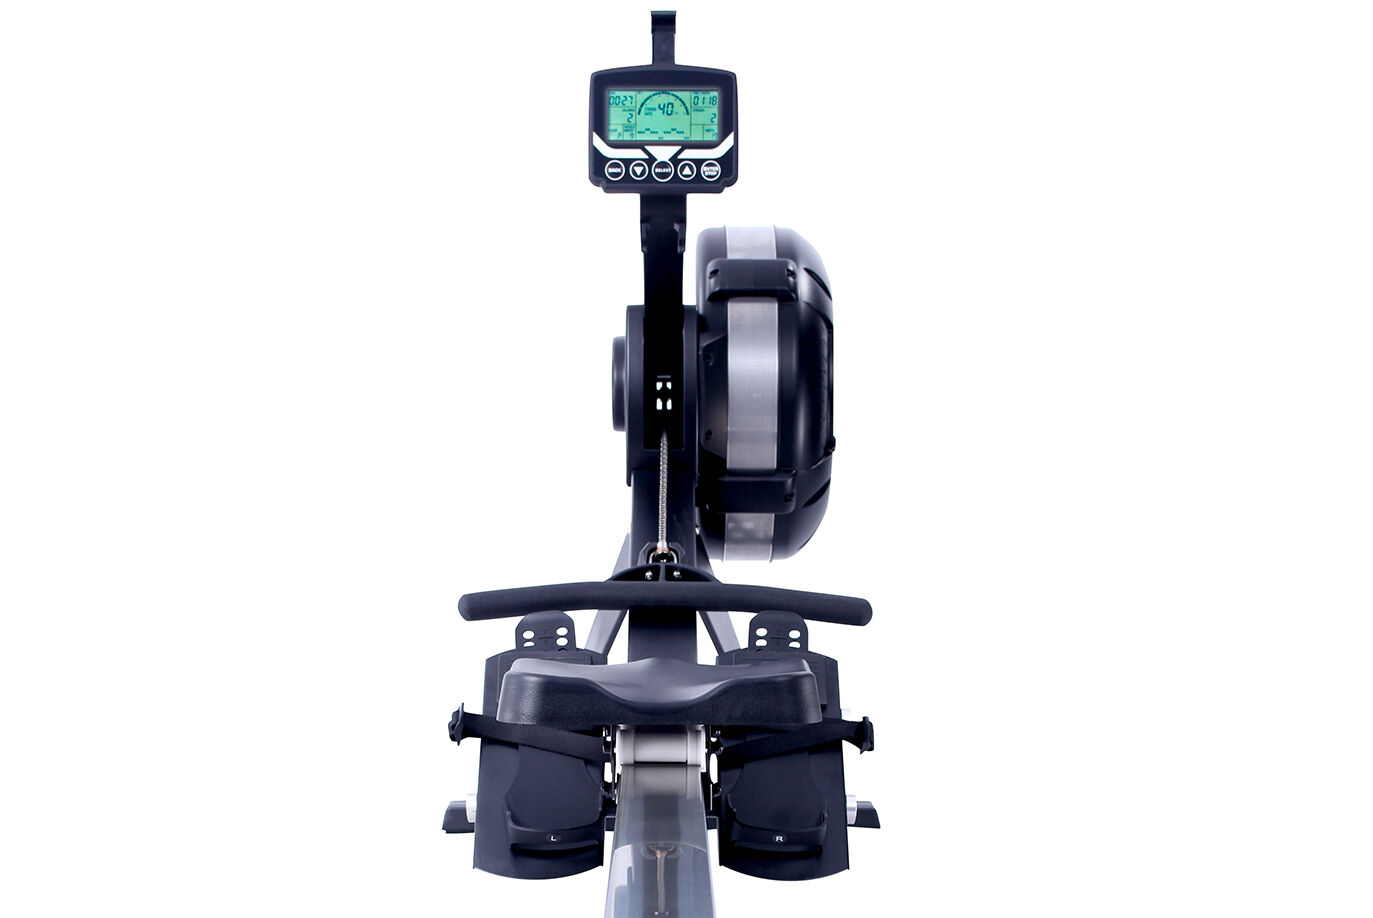 Front View Commercial Standard Indoor Rower